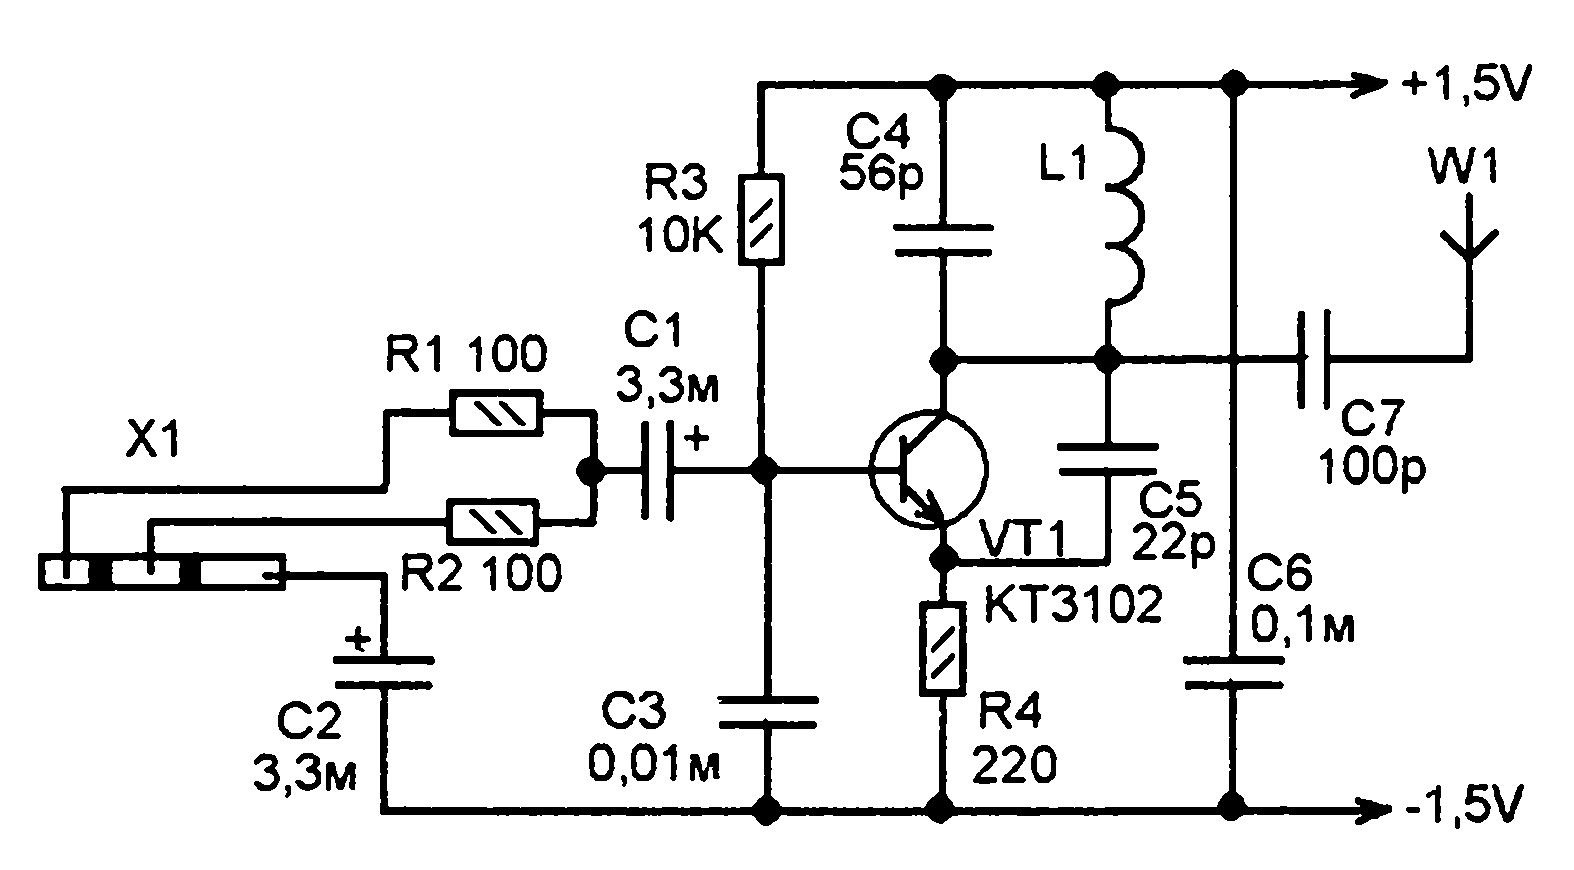 фм радиопередатчики схема